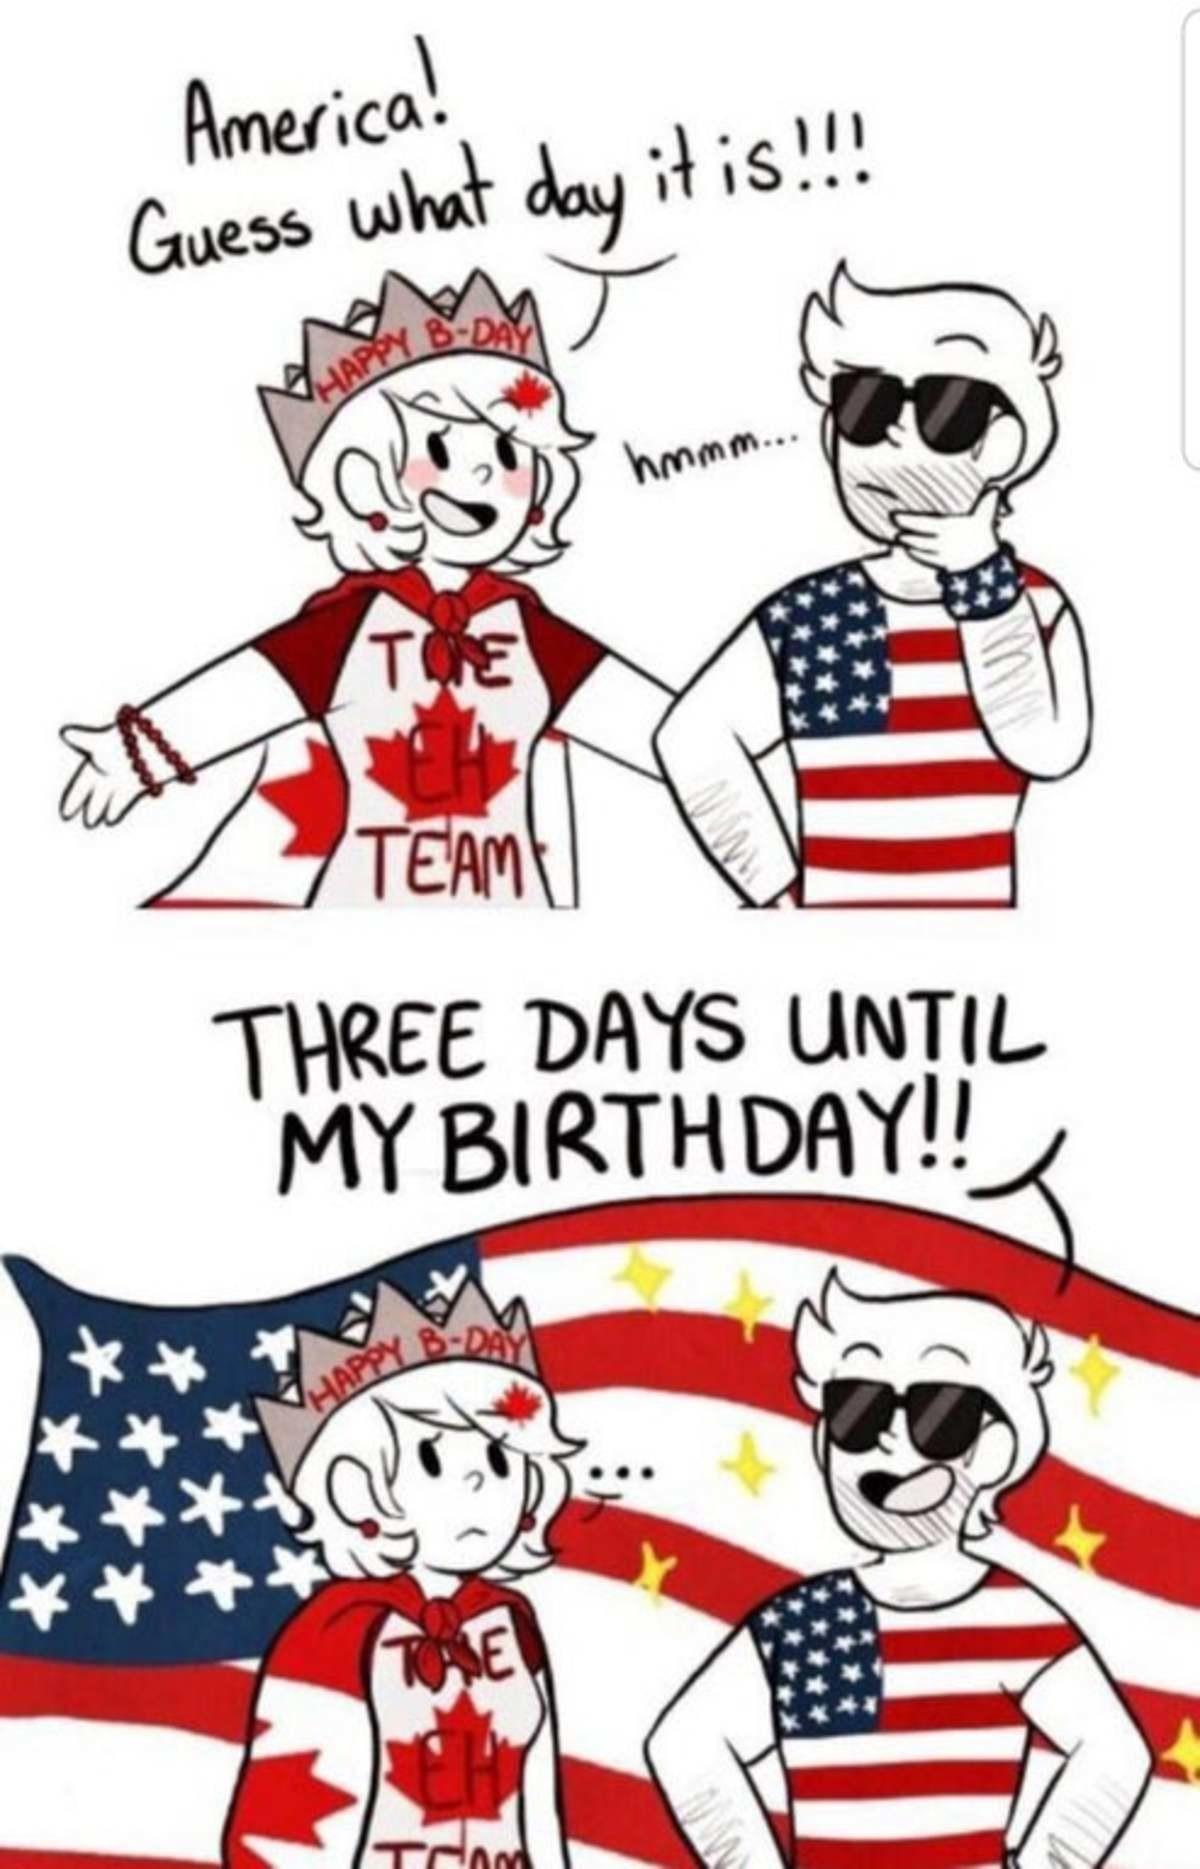 It is Canada day my dudes. .. Happy birthday Canada